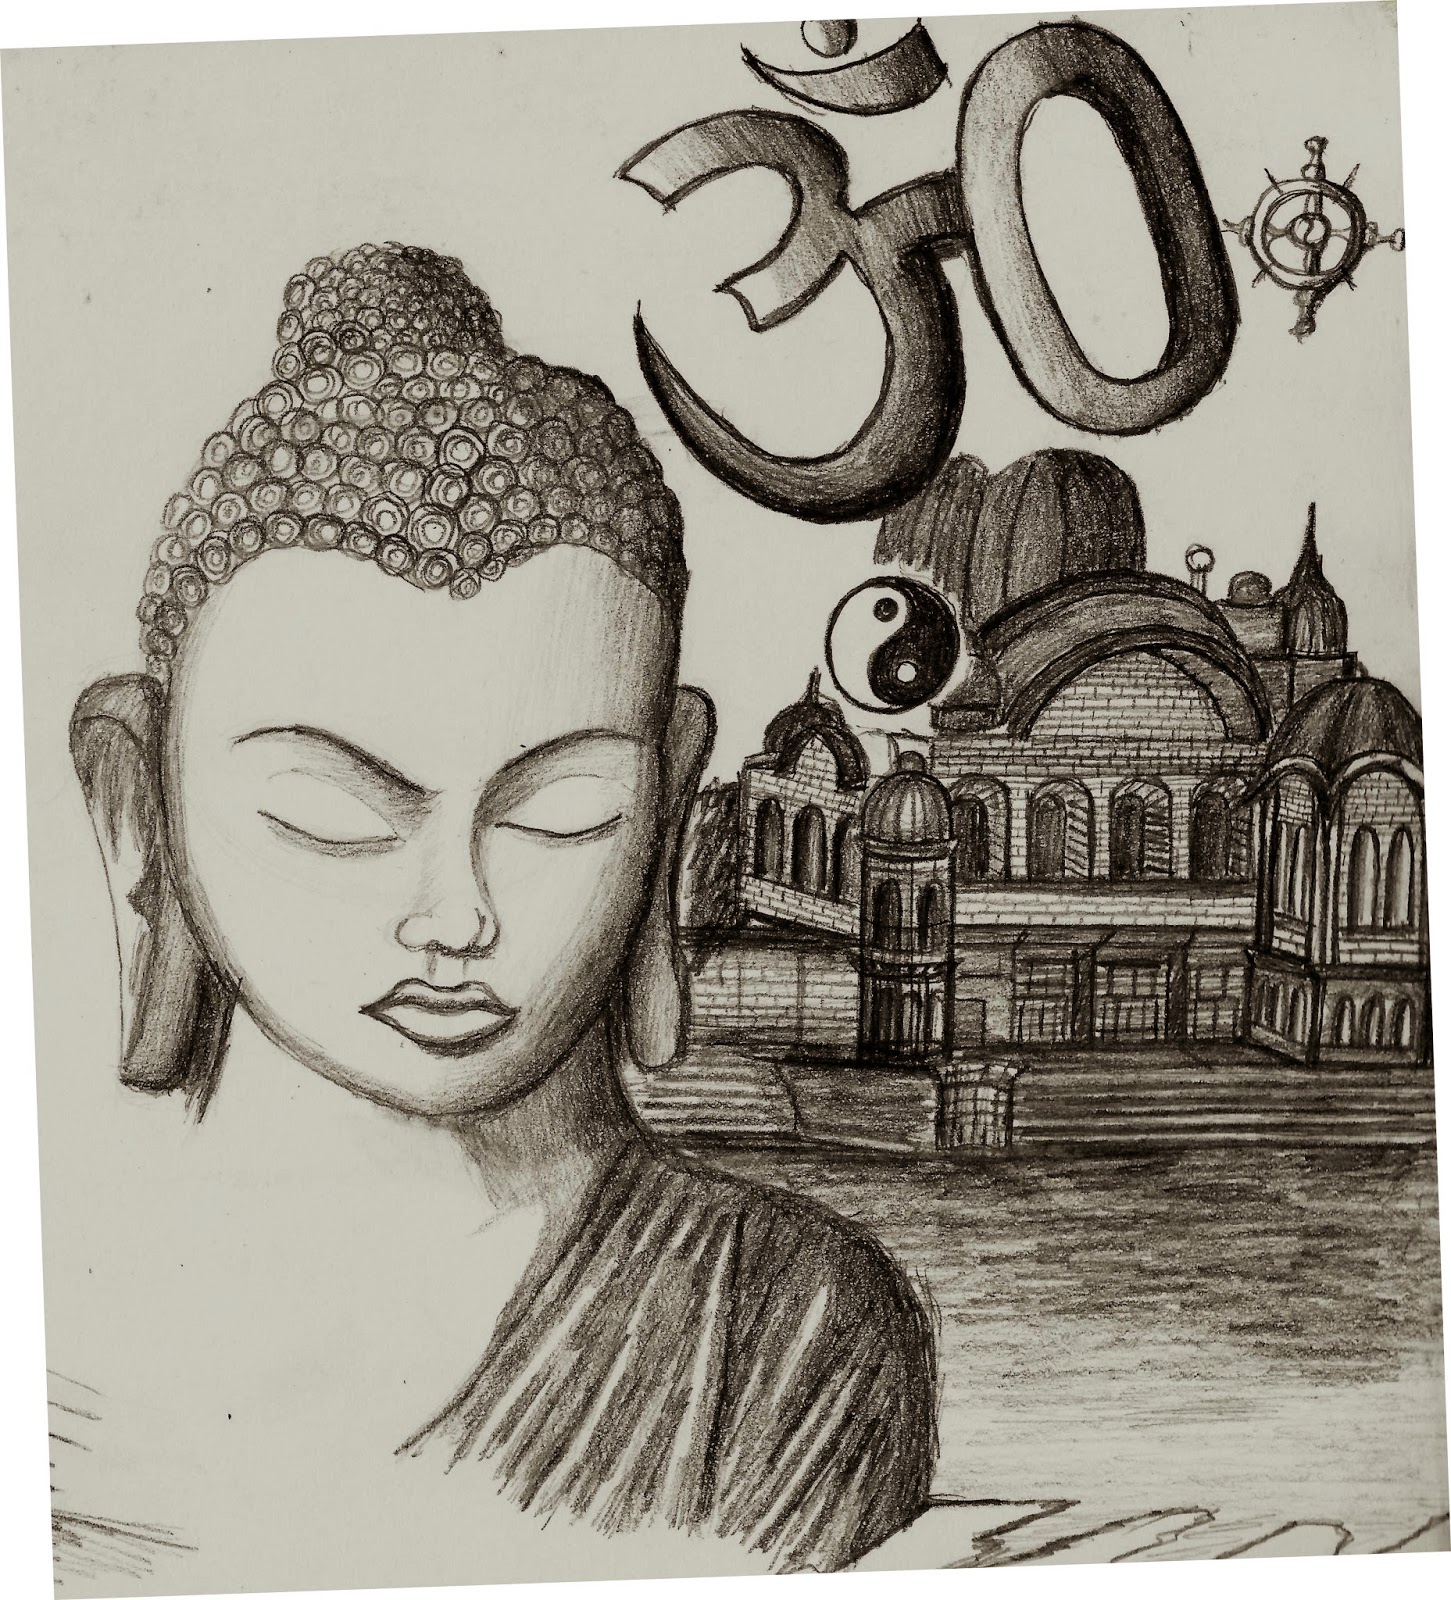 gefunden zu Siddhartha Deo auf http://dibujoscomplejos.blogspot.com